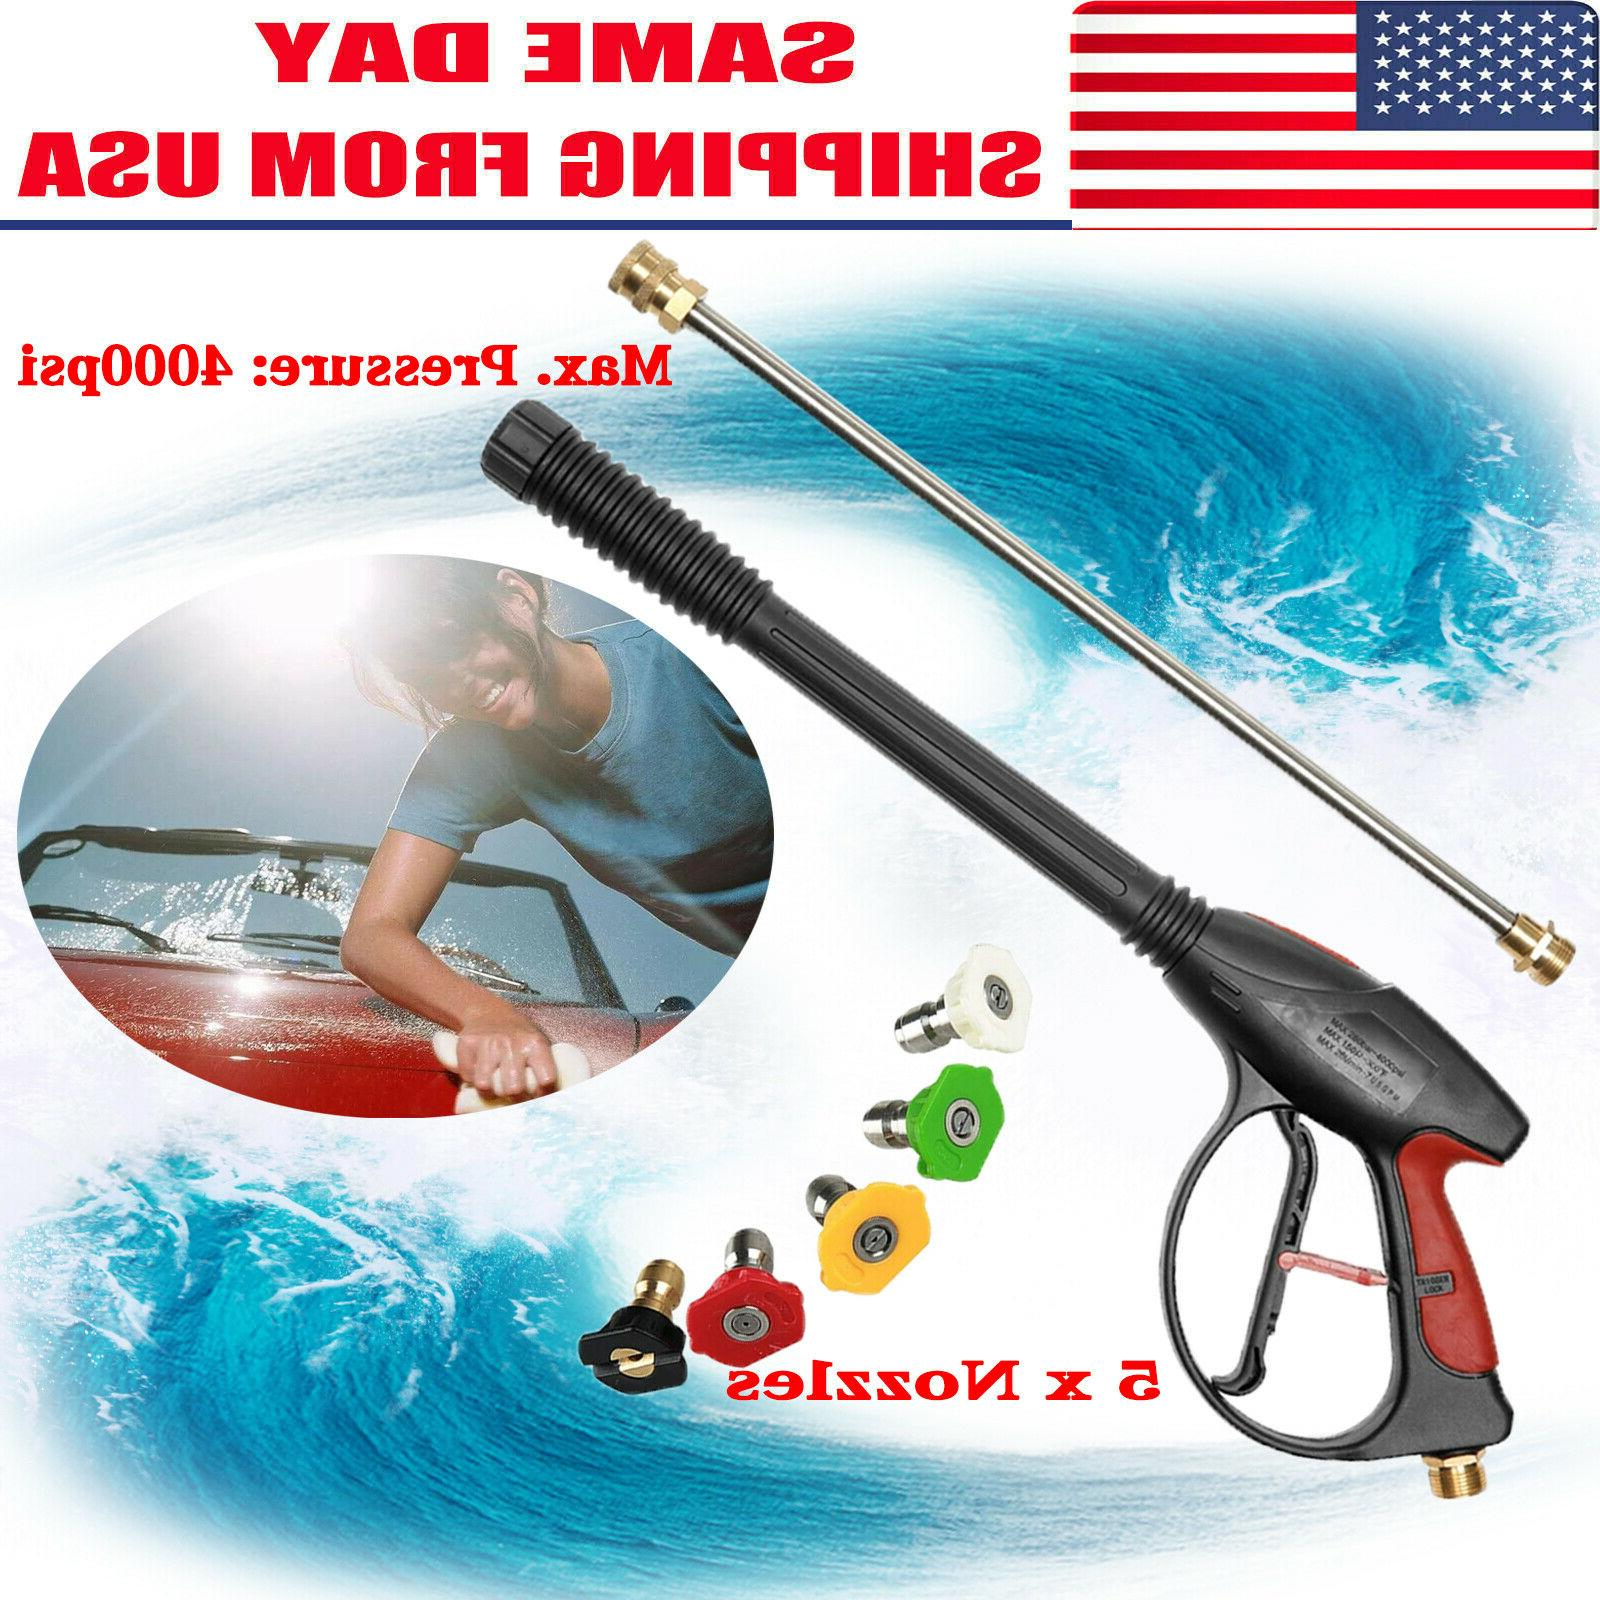 spray gun wand lance and tips power